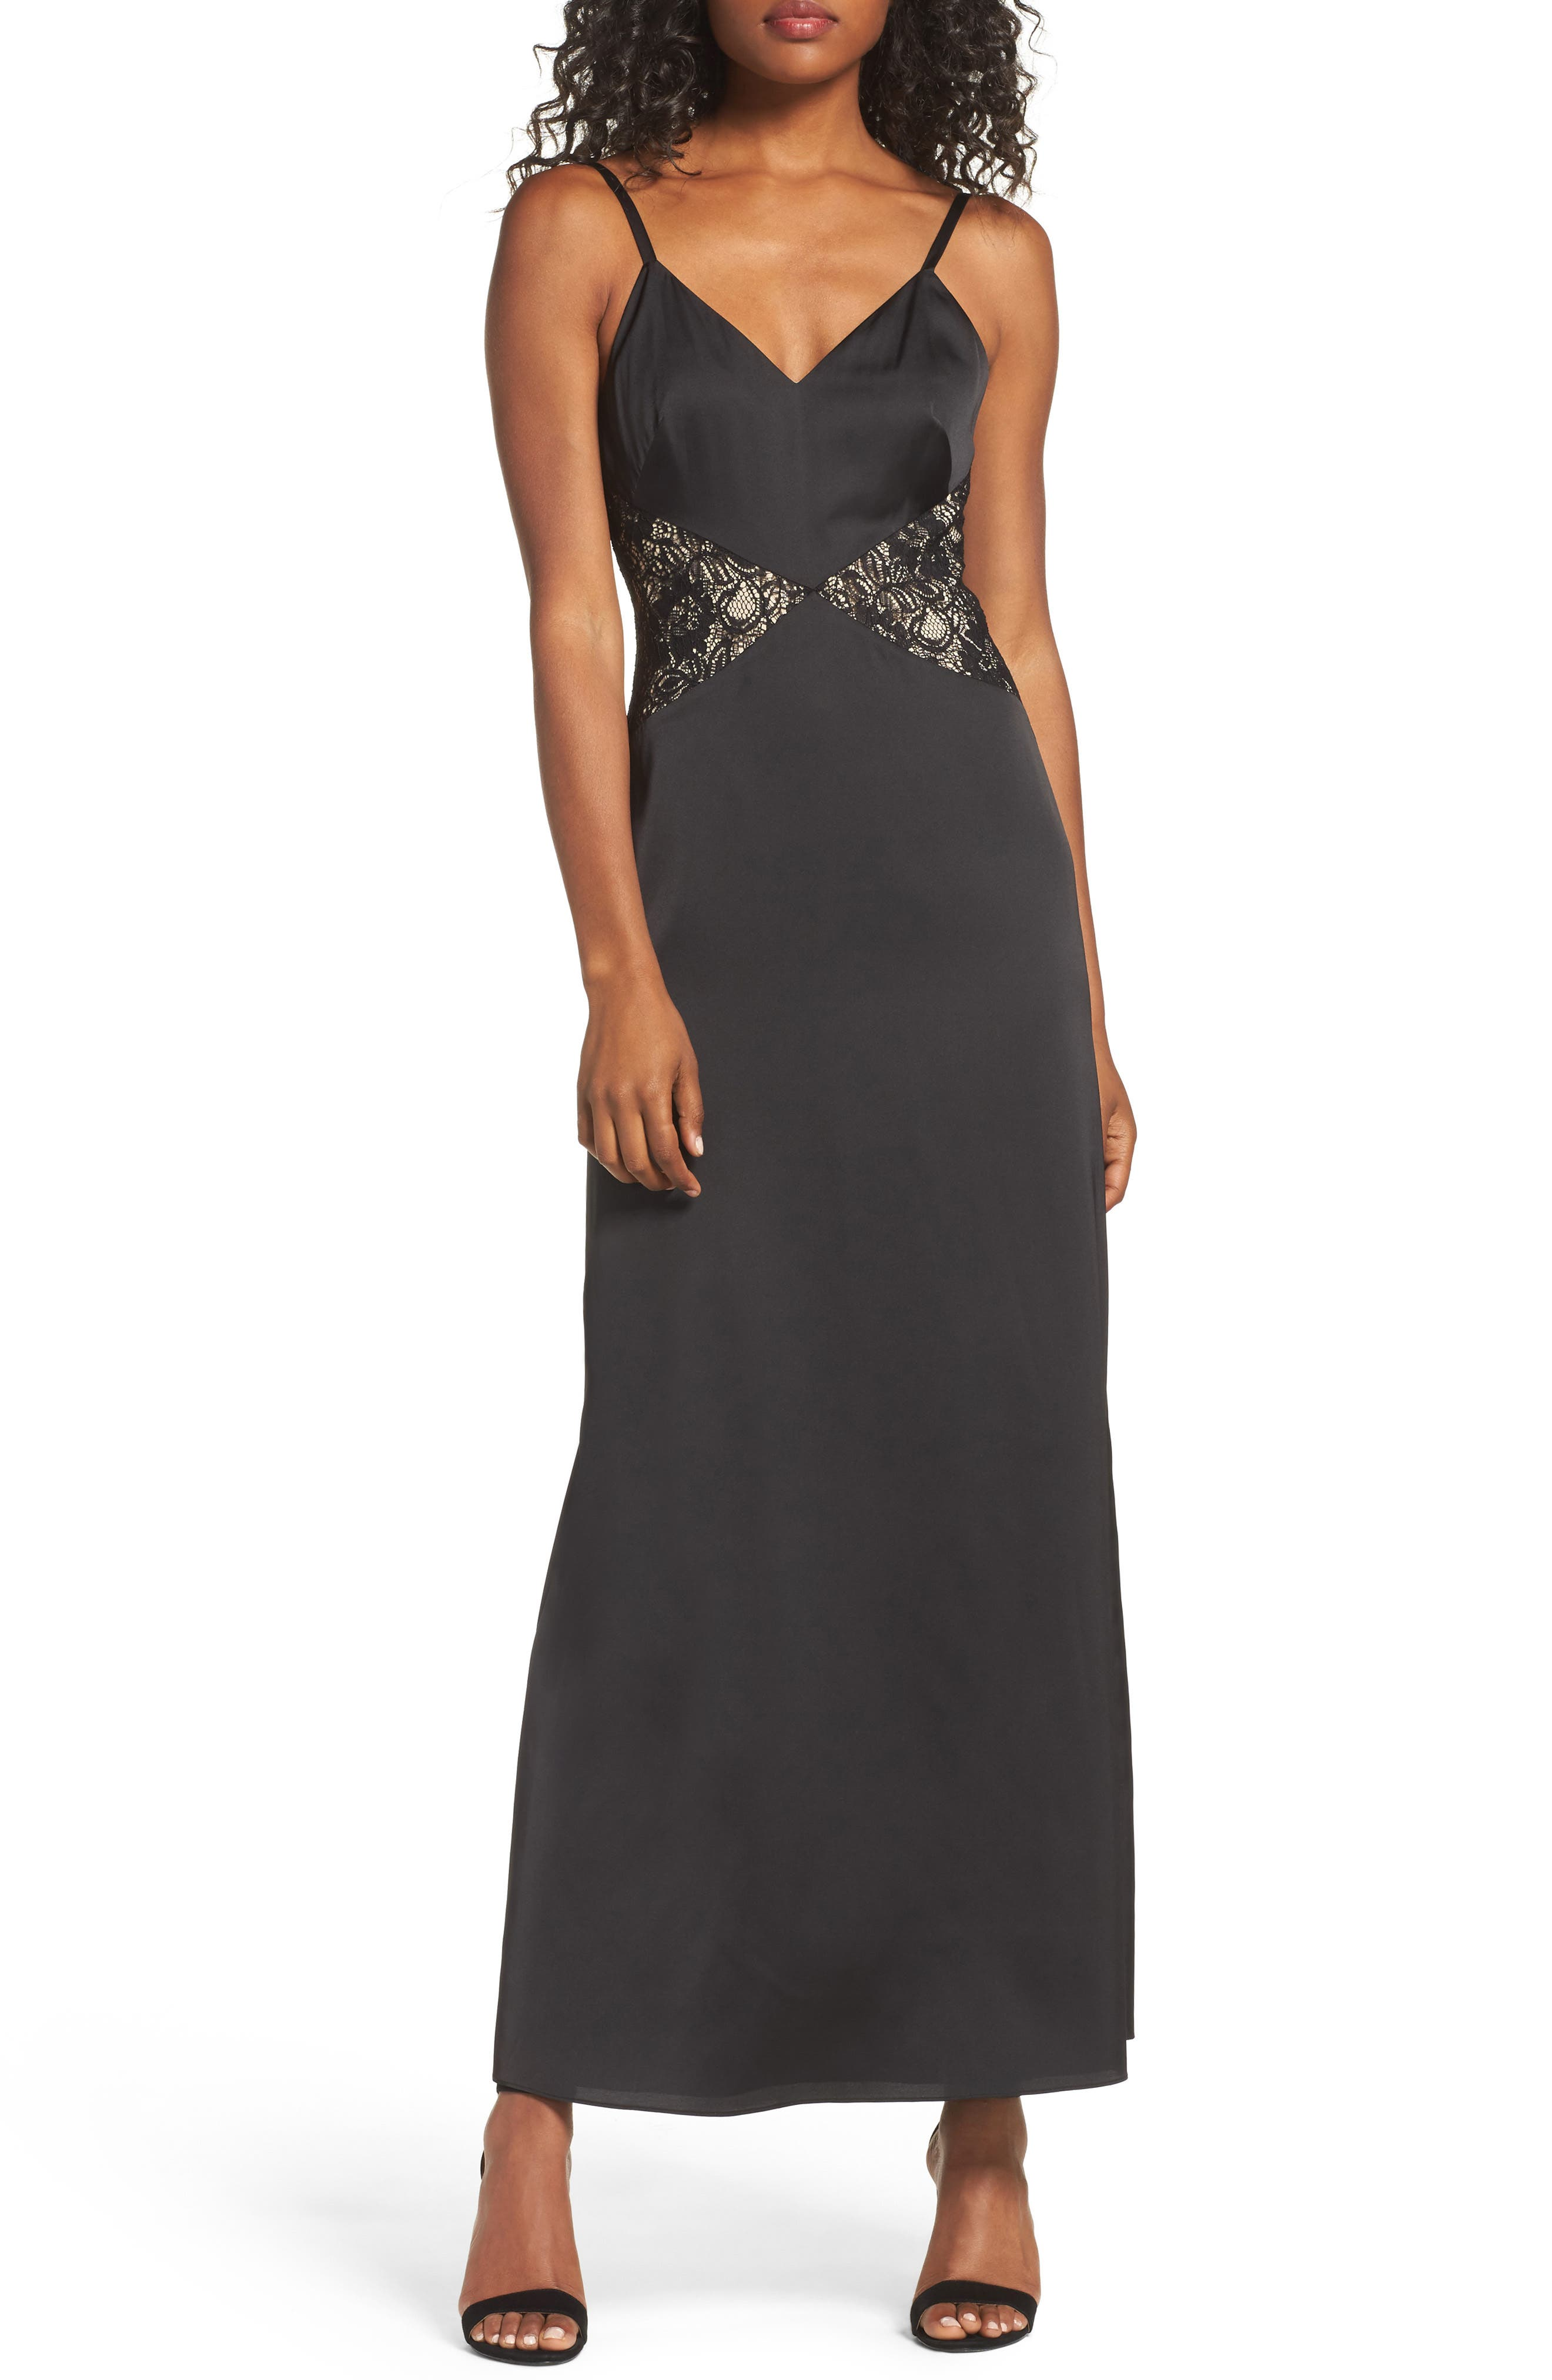 Femme Fatale Slip Dress,                             Main thumbnail 1, color,                             Black